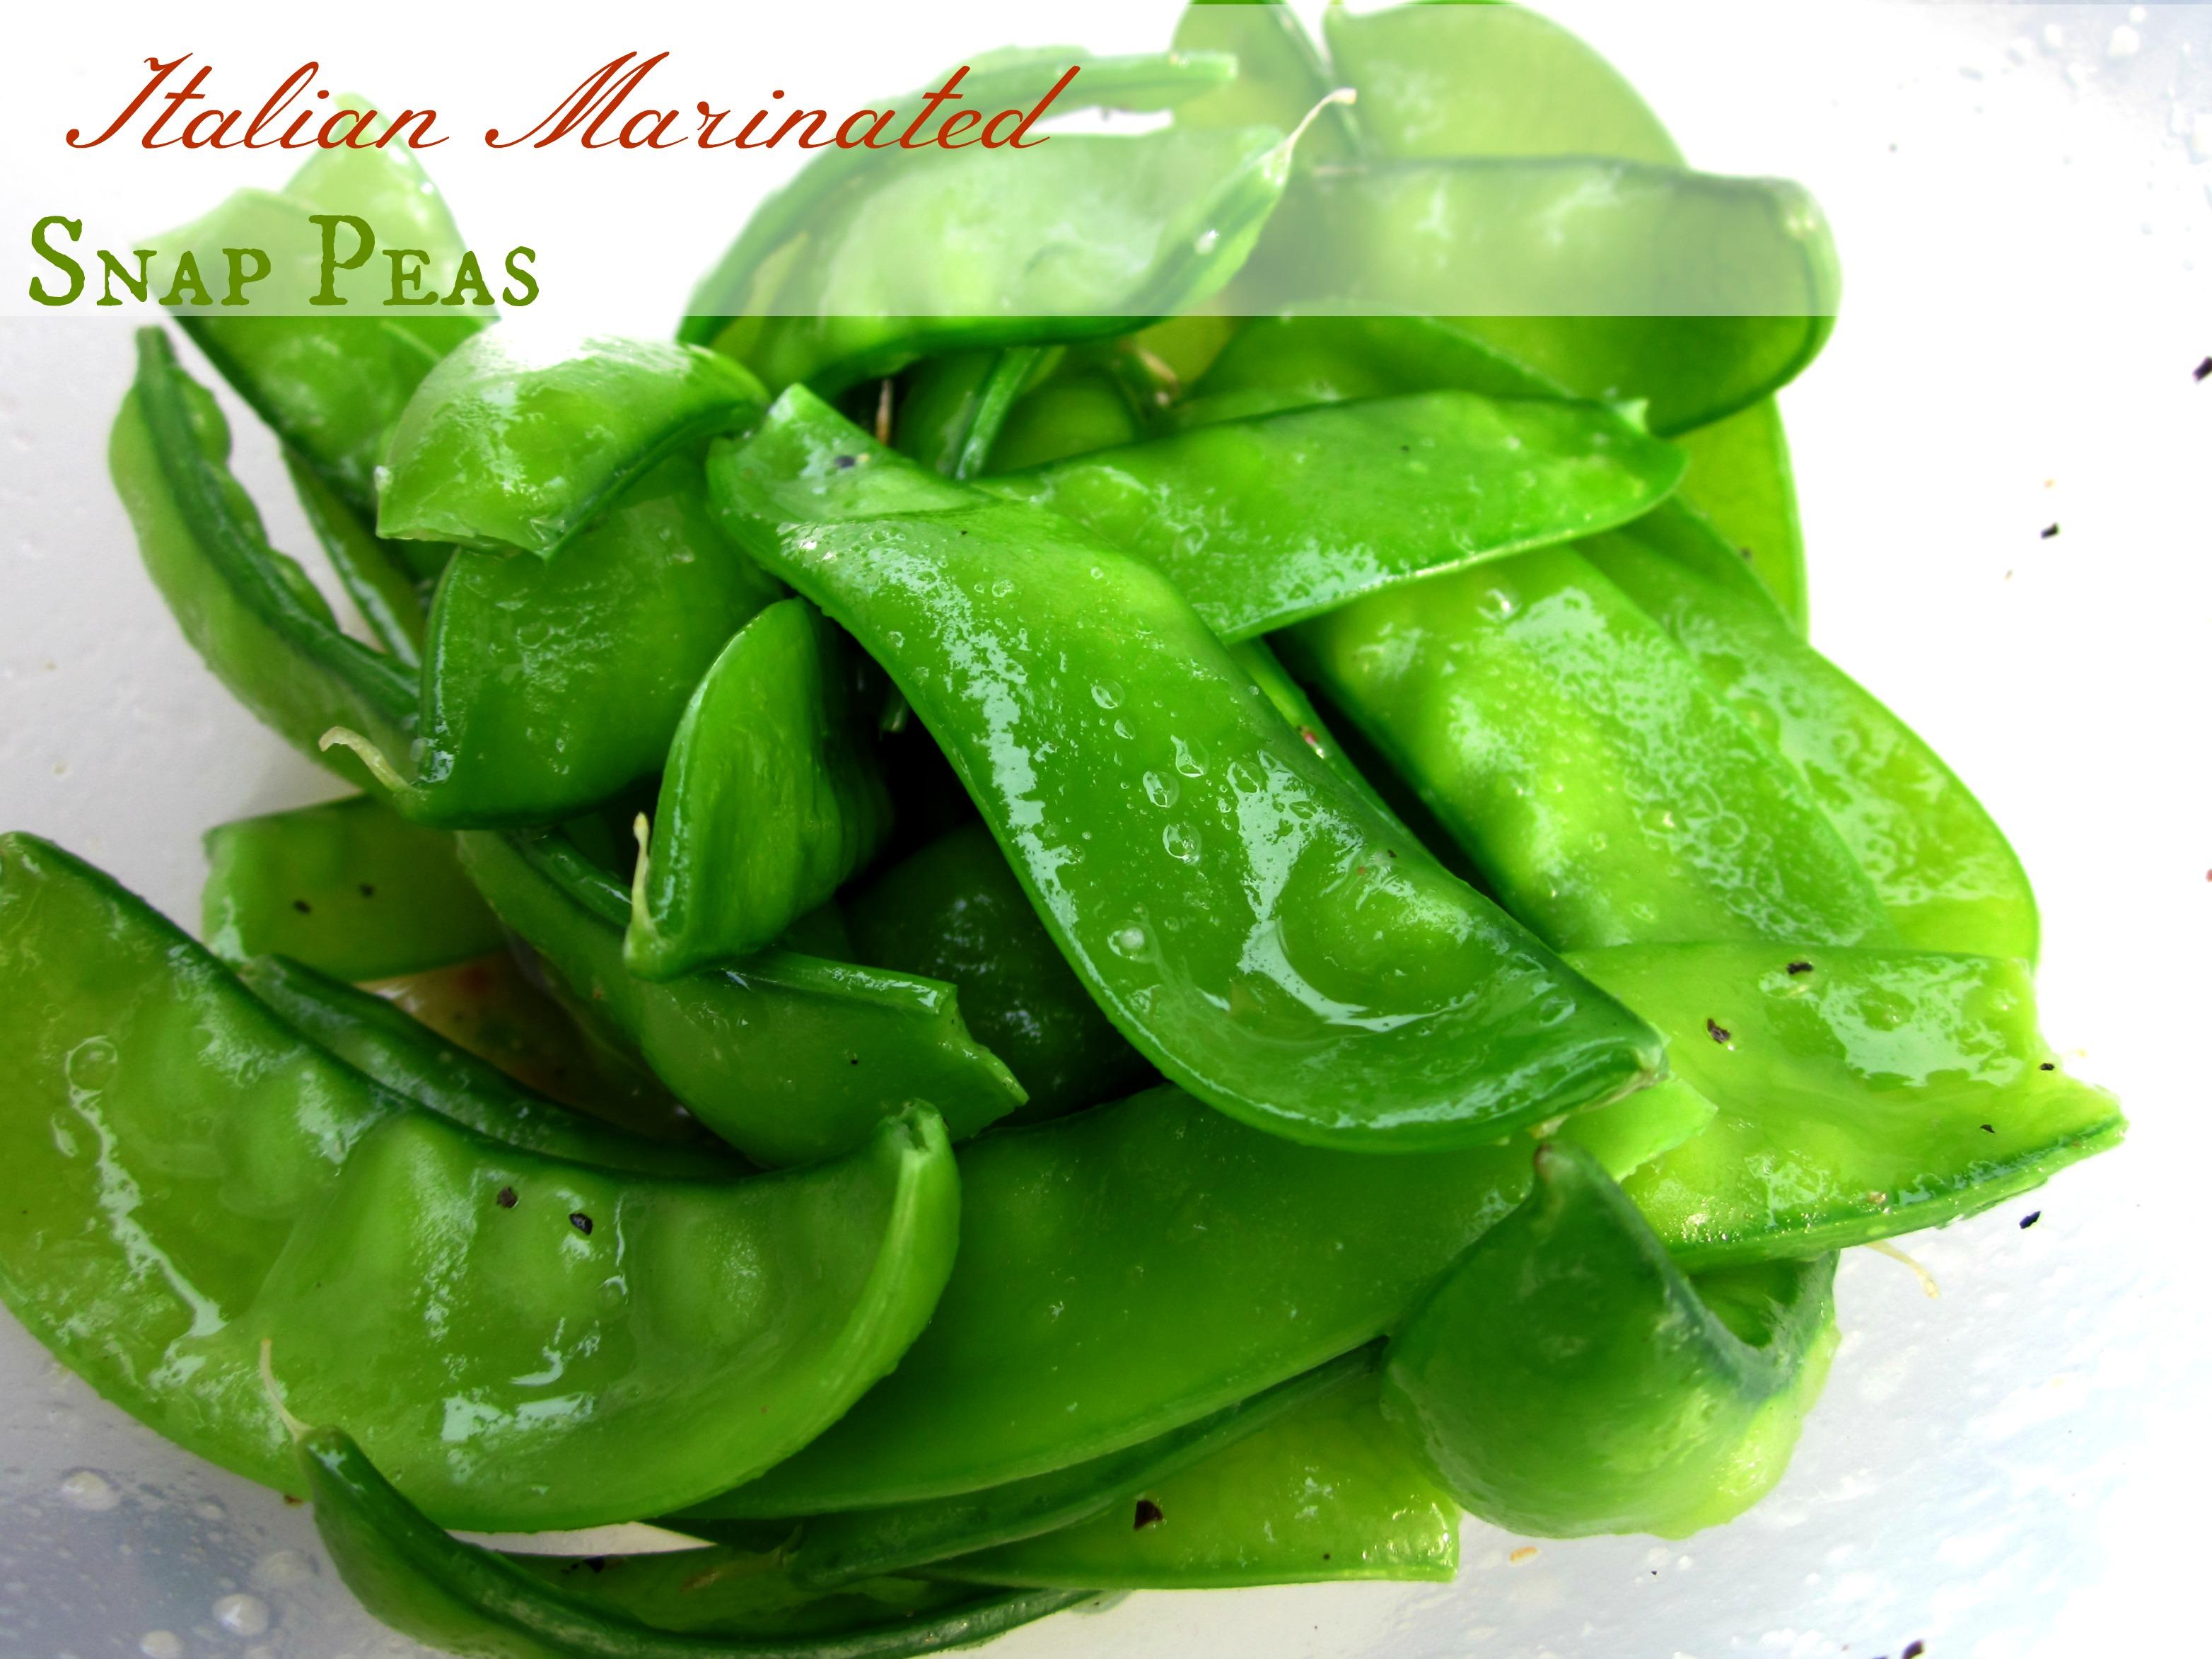 Italian Marinated Snap Peas